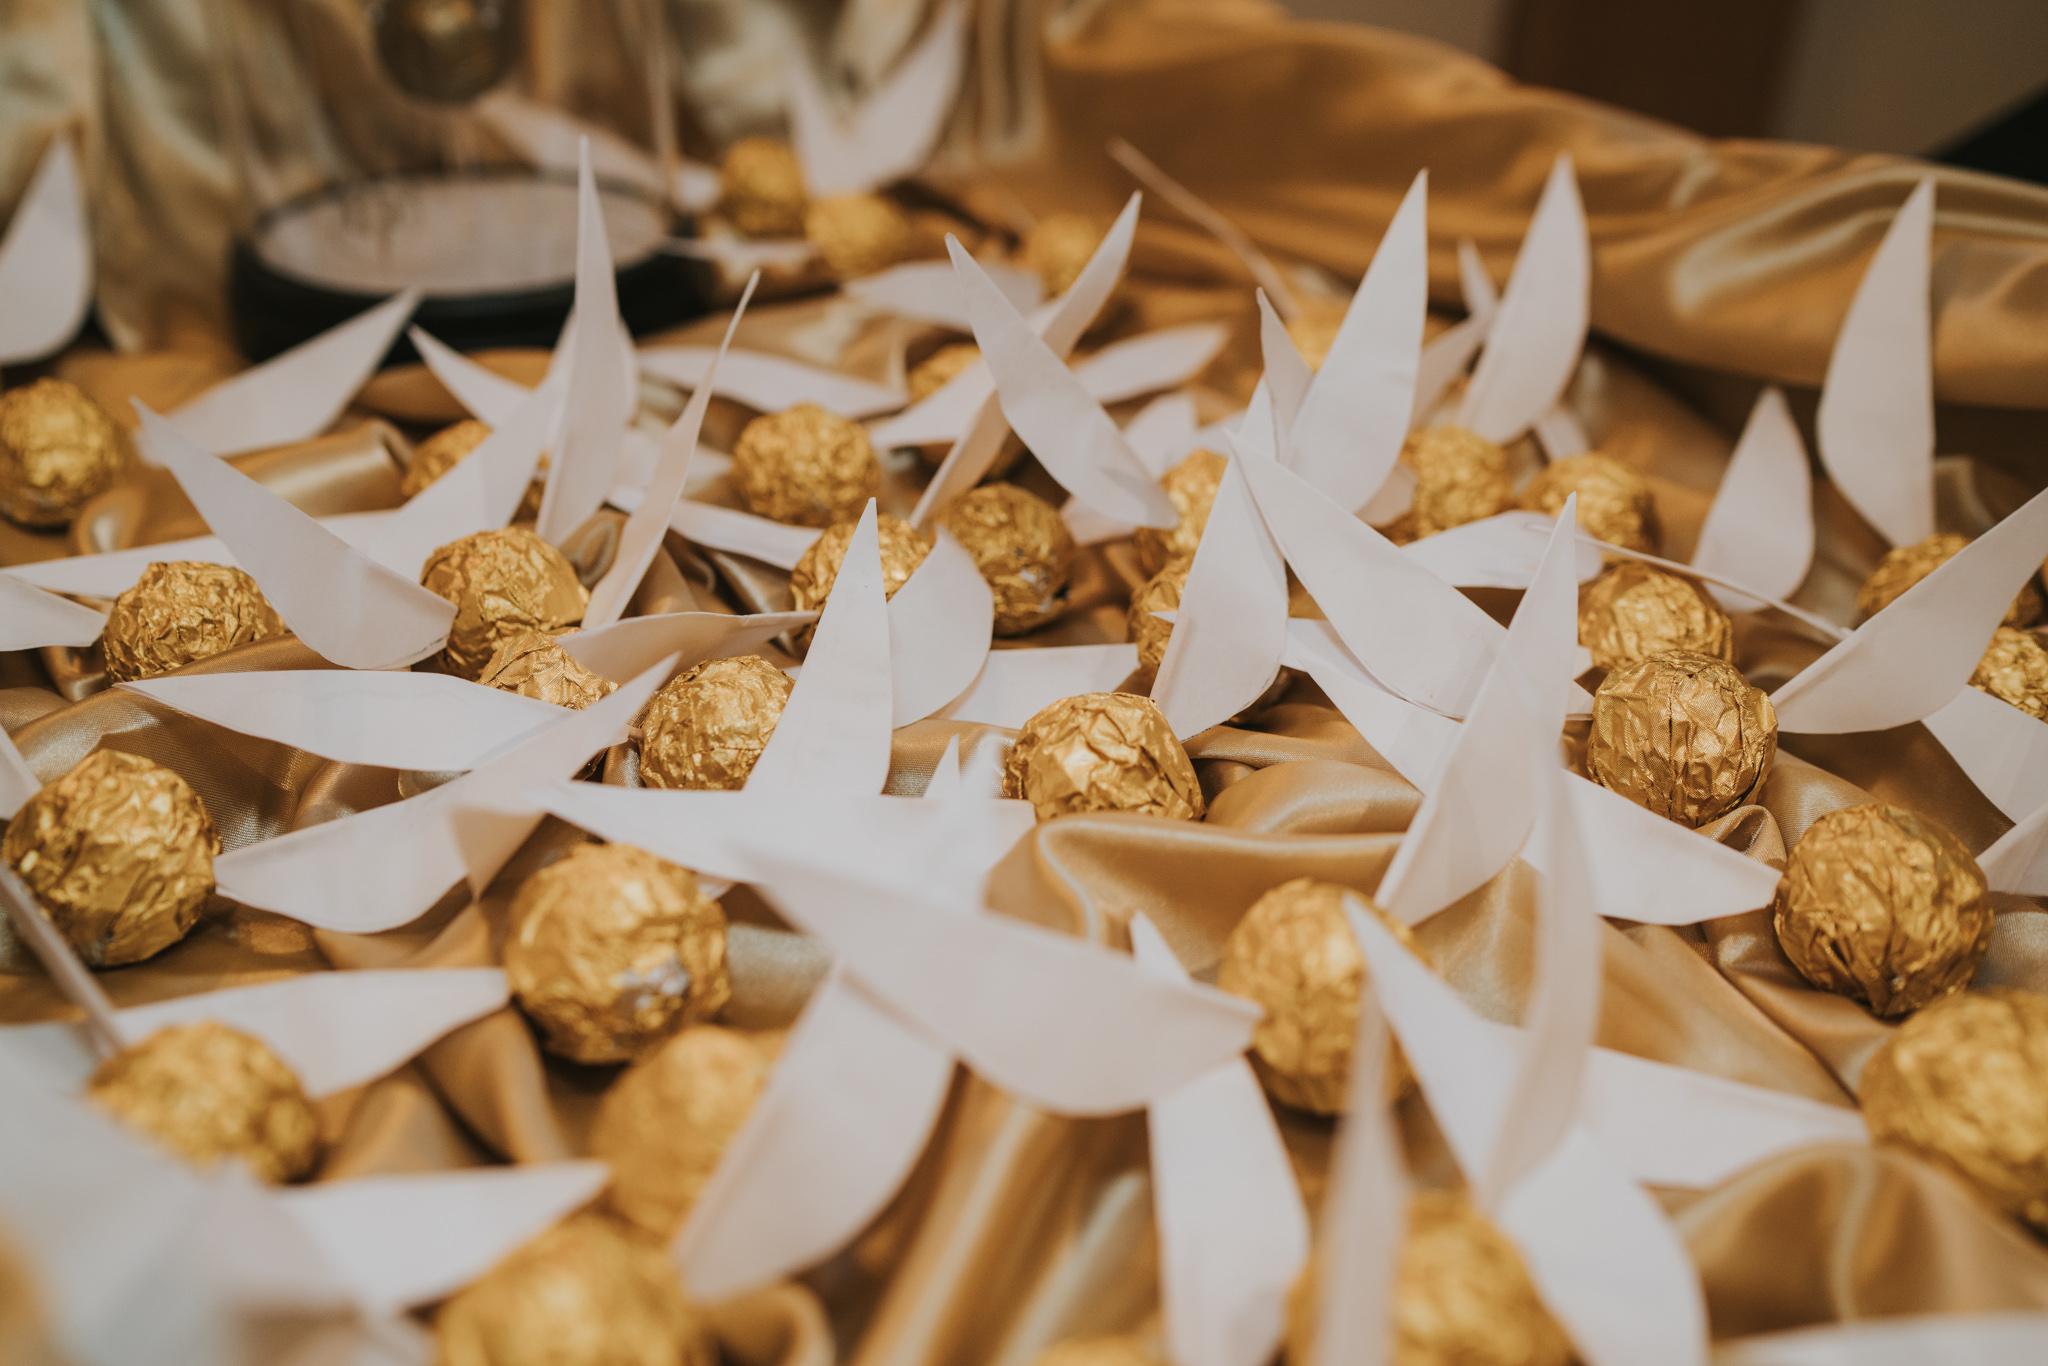 rhia-james-rustic-crabbs-barn-vintage-50s-retro-wedding-grace-elizabeth-colchester-essex-alternative-relaxed-wedding-family-photography-devon-suffolk-norfolk-essex (53 of 138).jpg